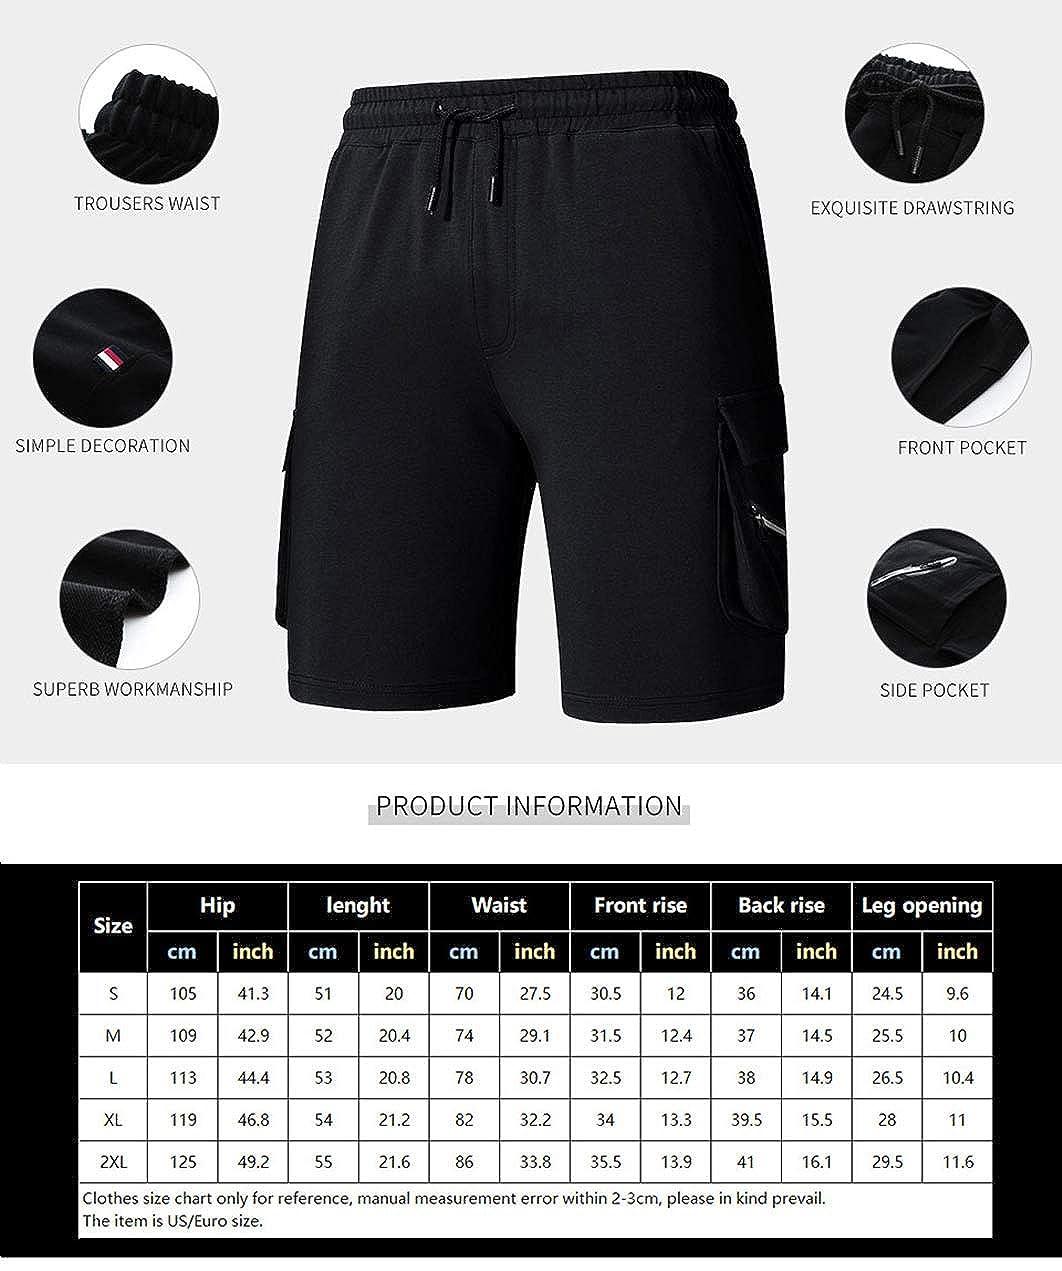 FEOYA Mens Casual Classic Fit Elastic Waist Jogger Gym Shorts with Pockets